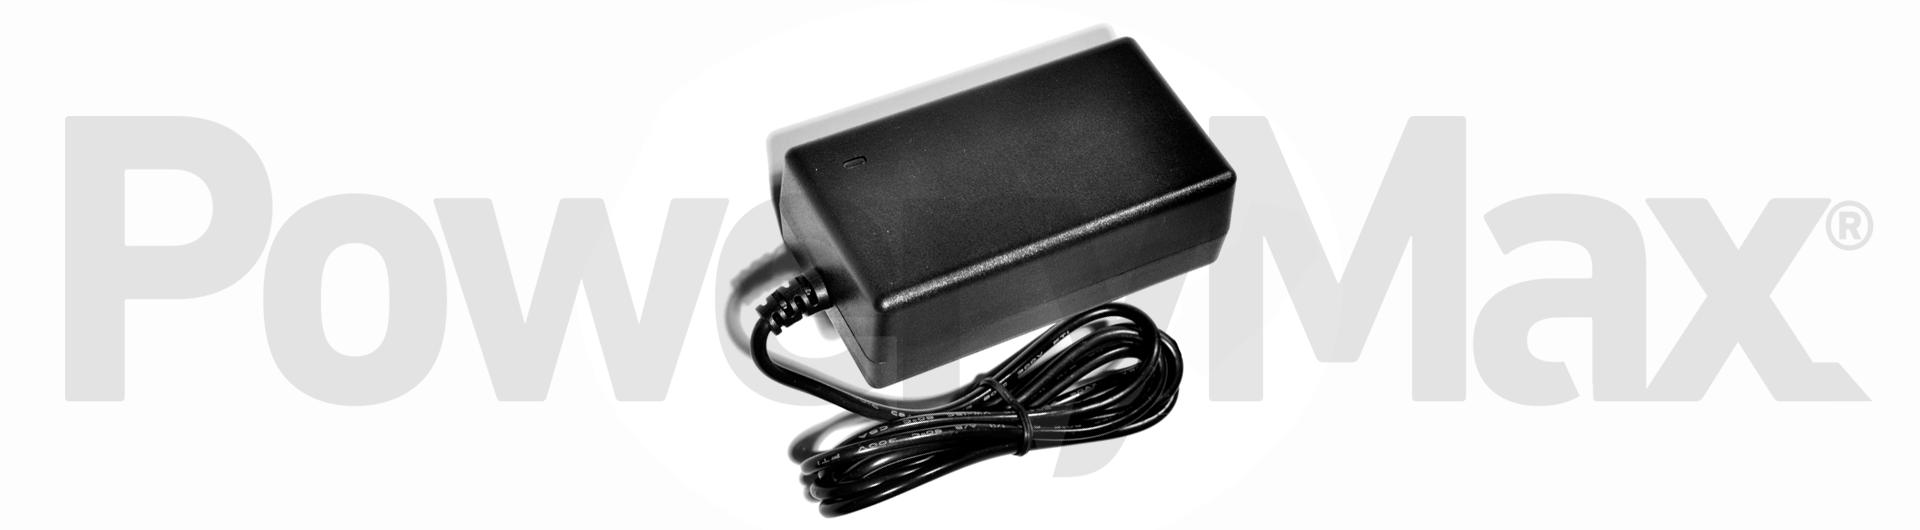 Cargador PoweryMax 2A